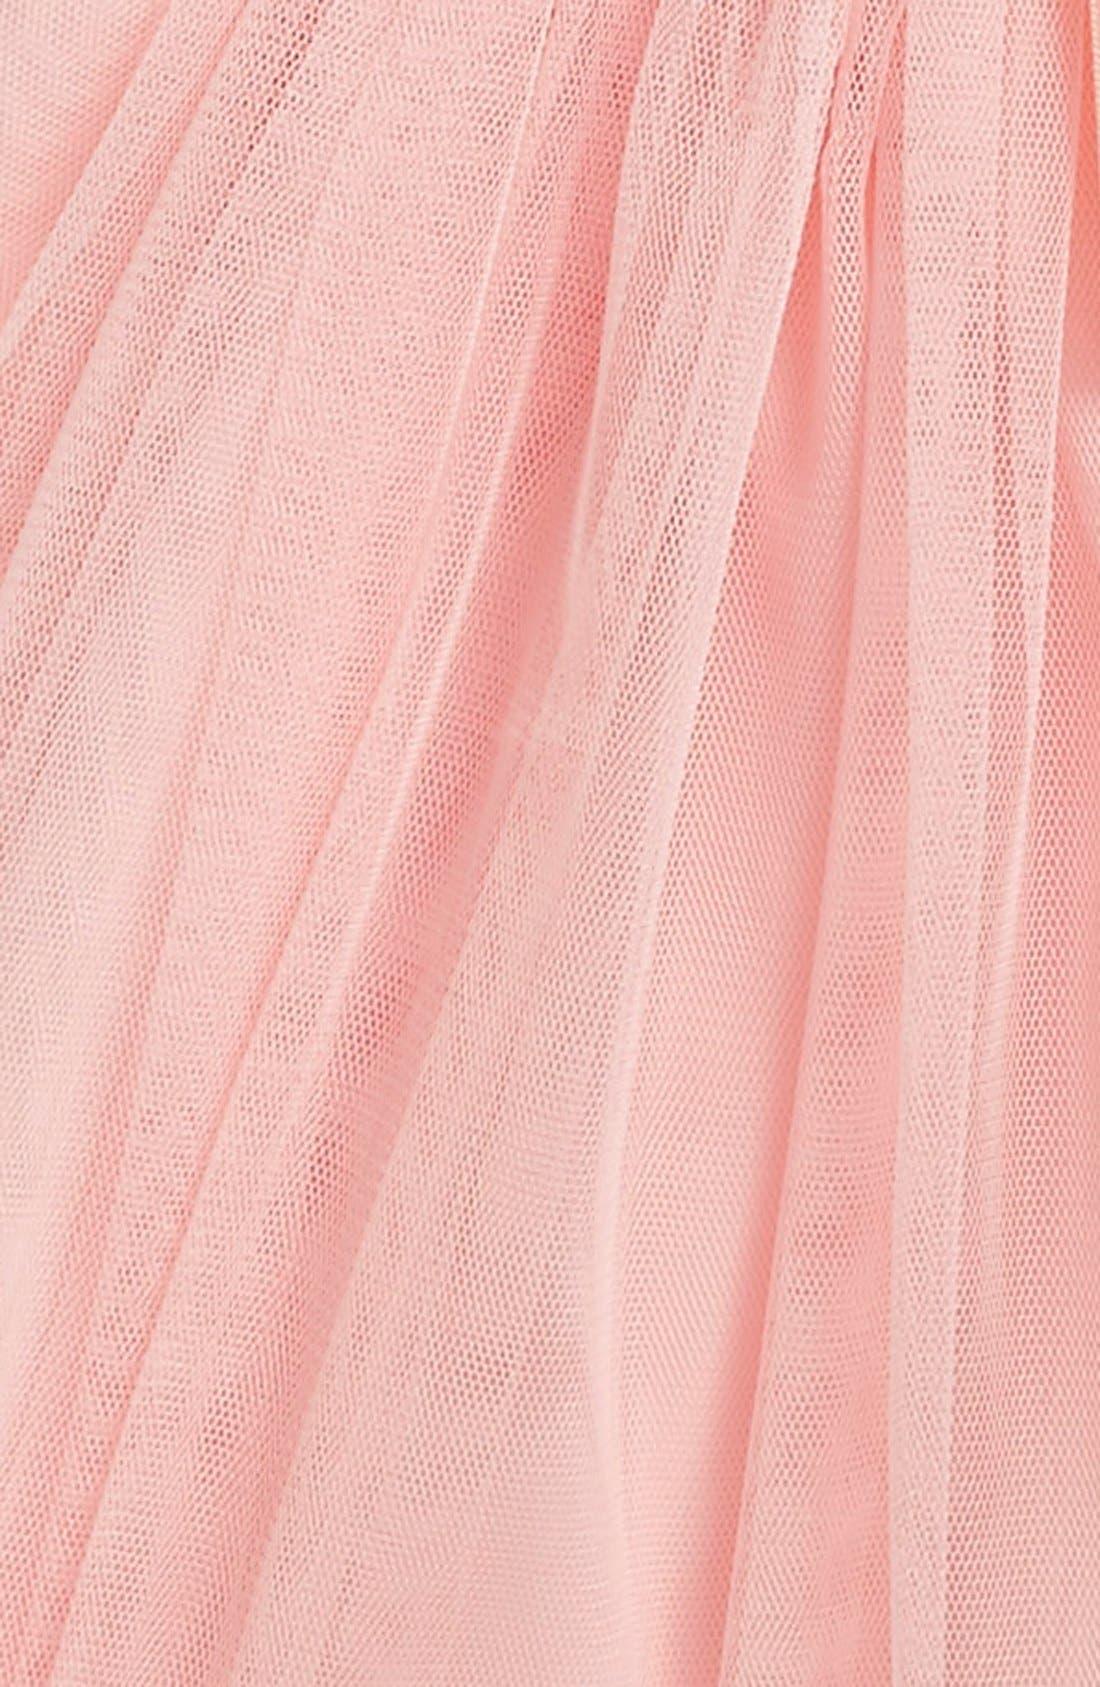 Empire Waist Rosette Dress,                             Alternate thumbnail 2, color,                             PEACH